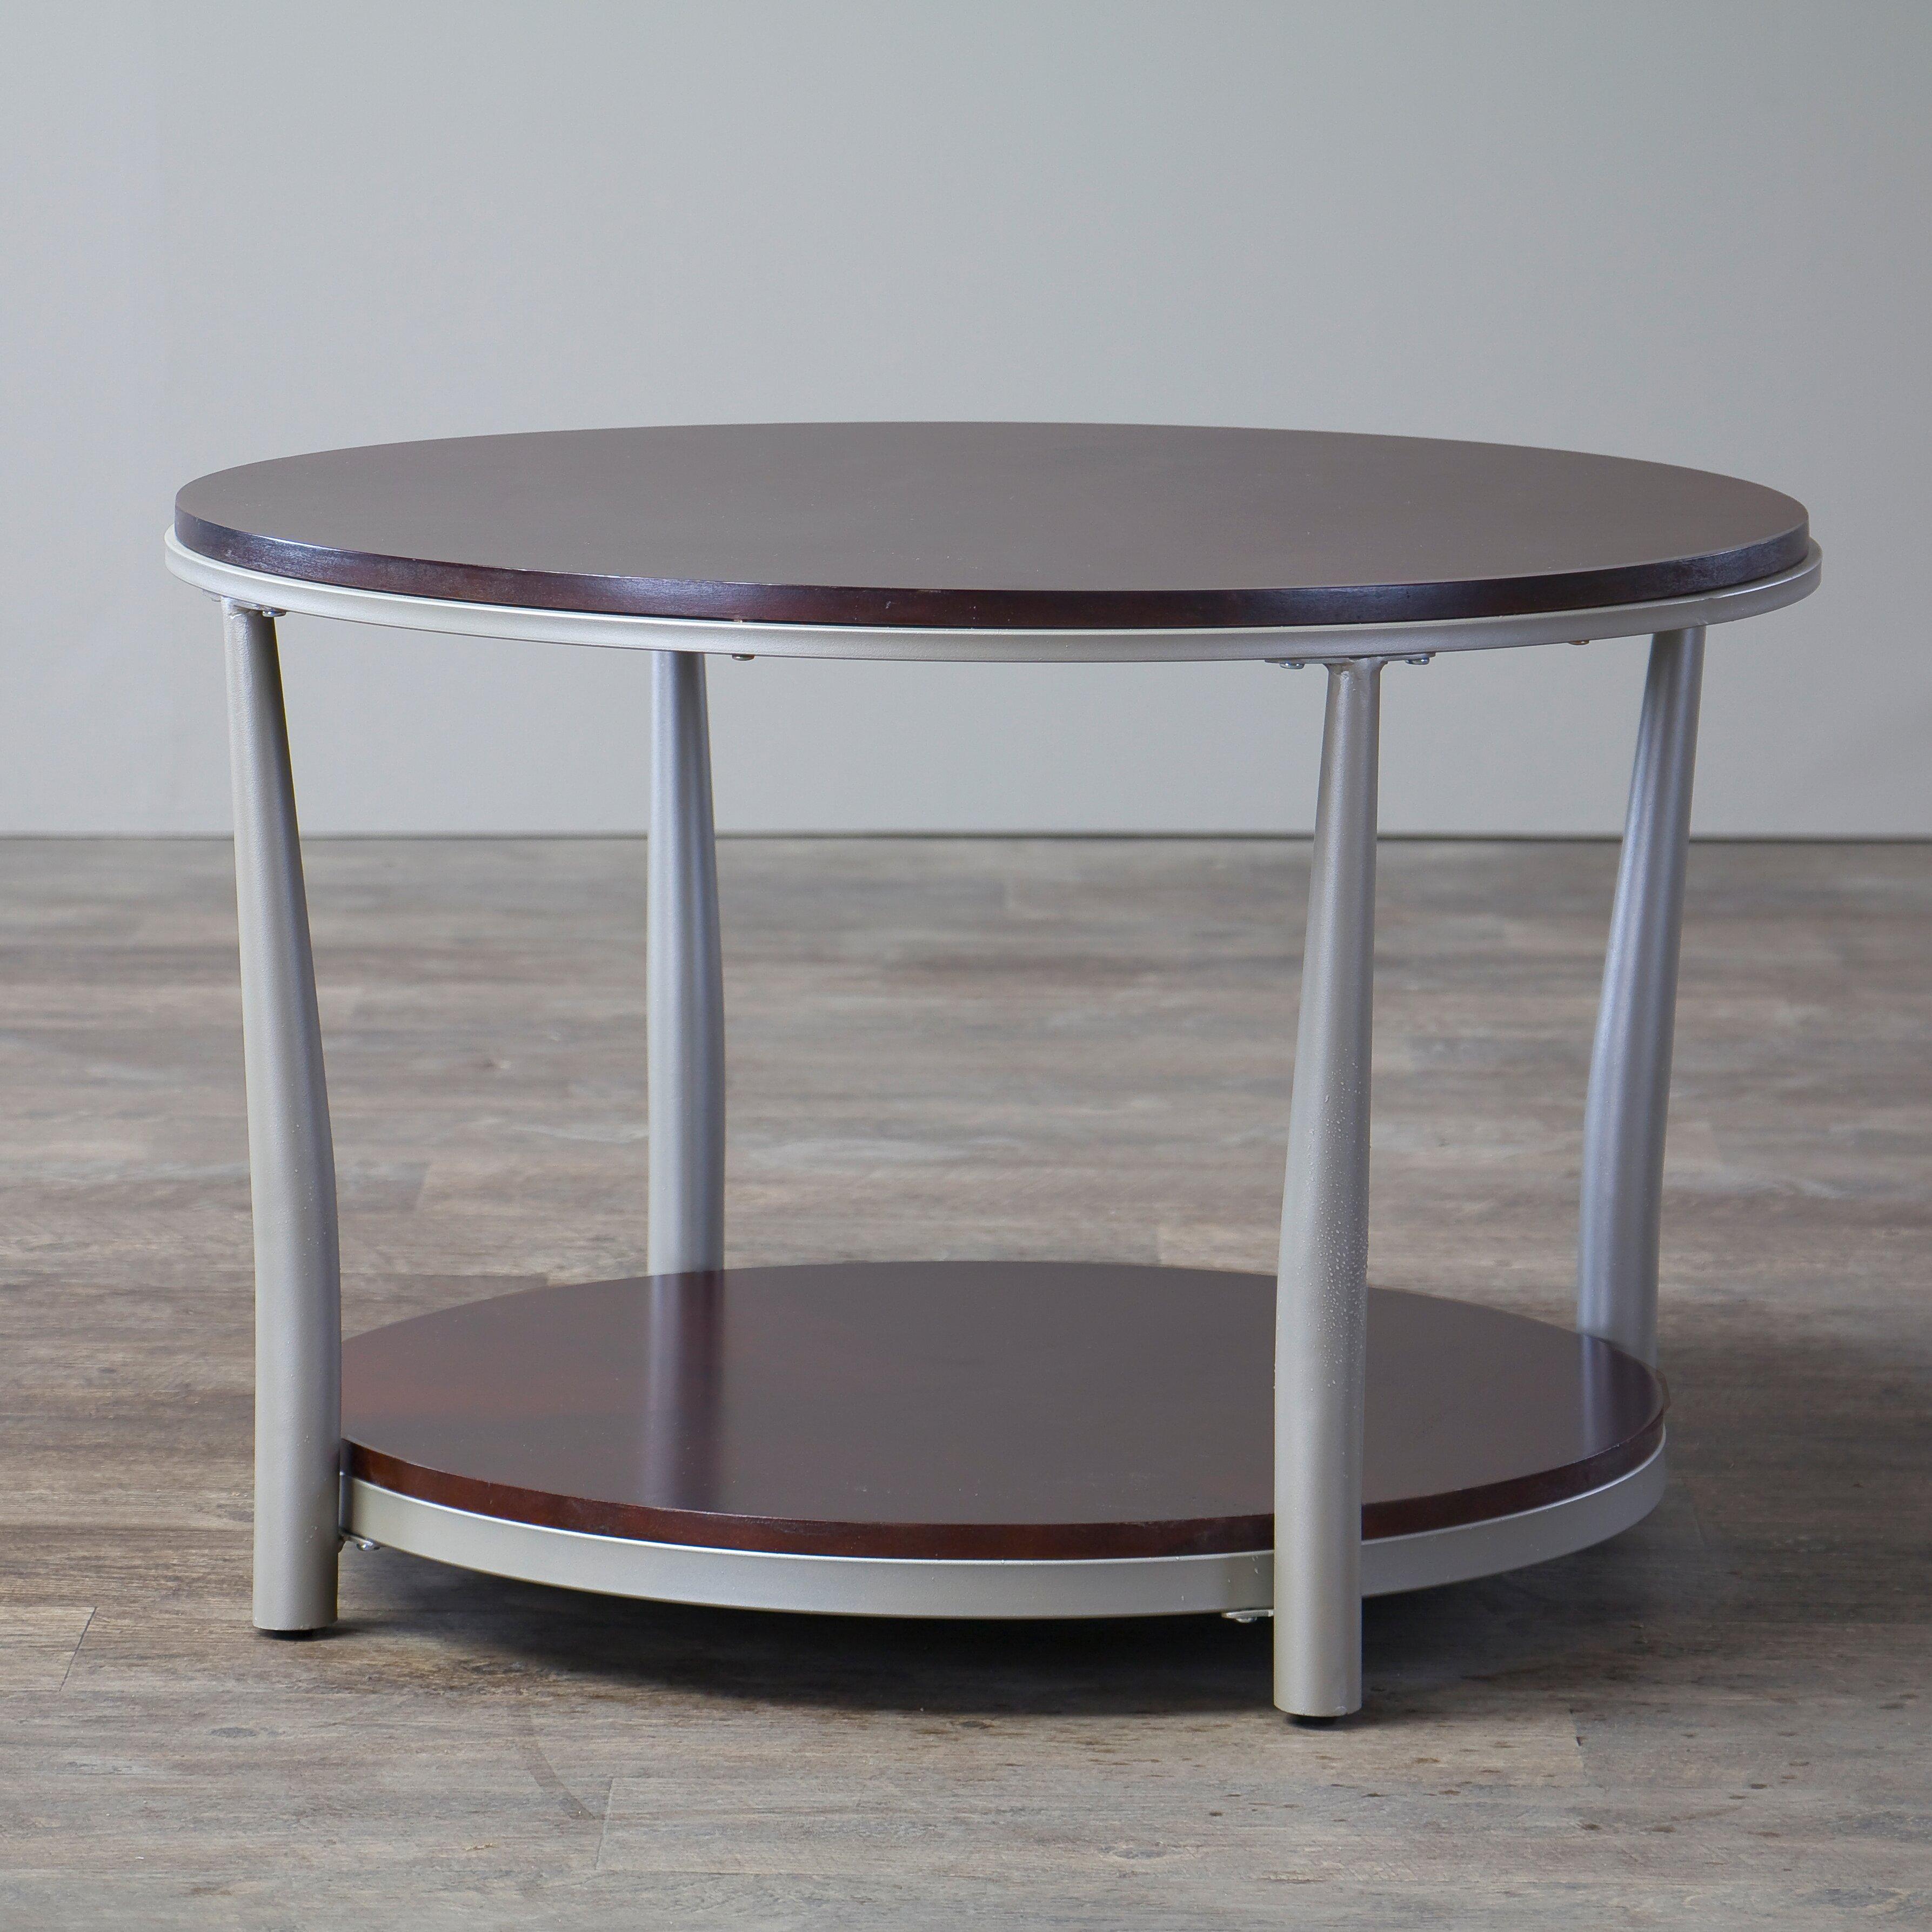 Https Www Wayfair Ca Halo Coffee Table Ylx 2667 Ct Whi5912 Html